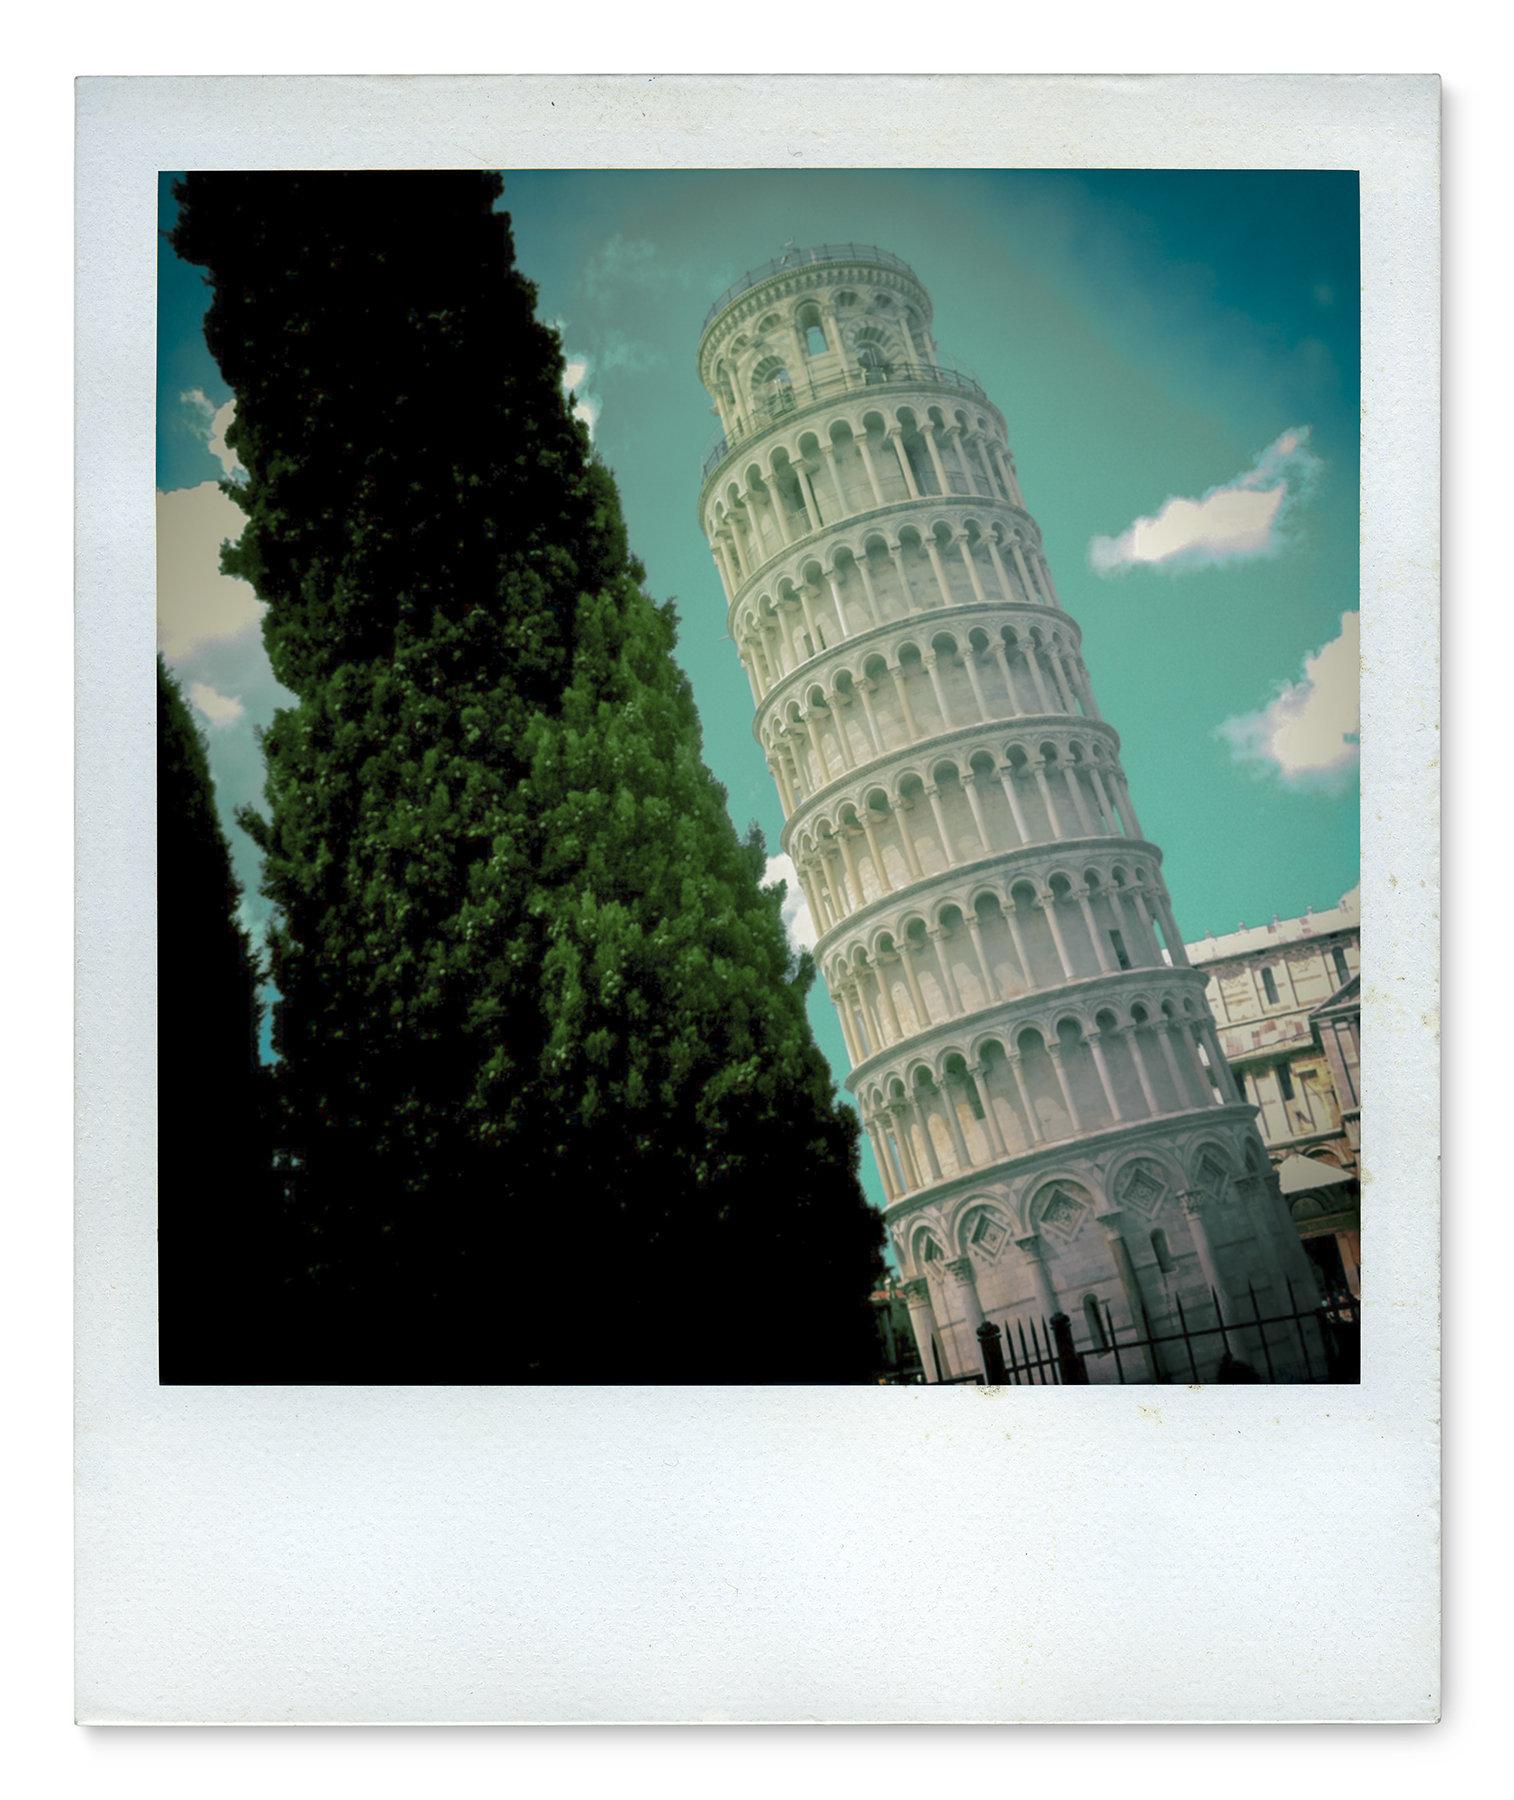 010_Polaroid SX70_IMG_2352-3.jpg